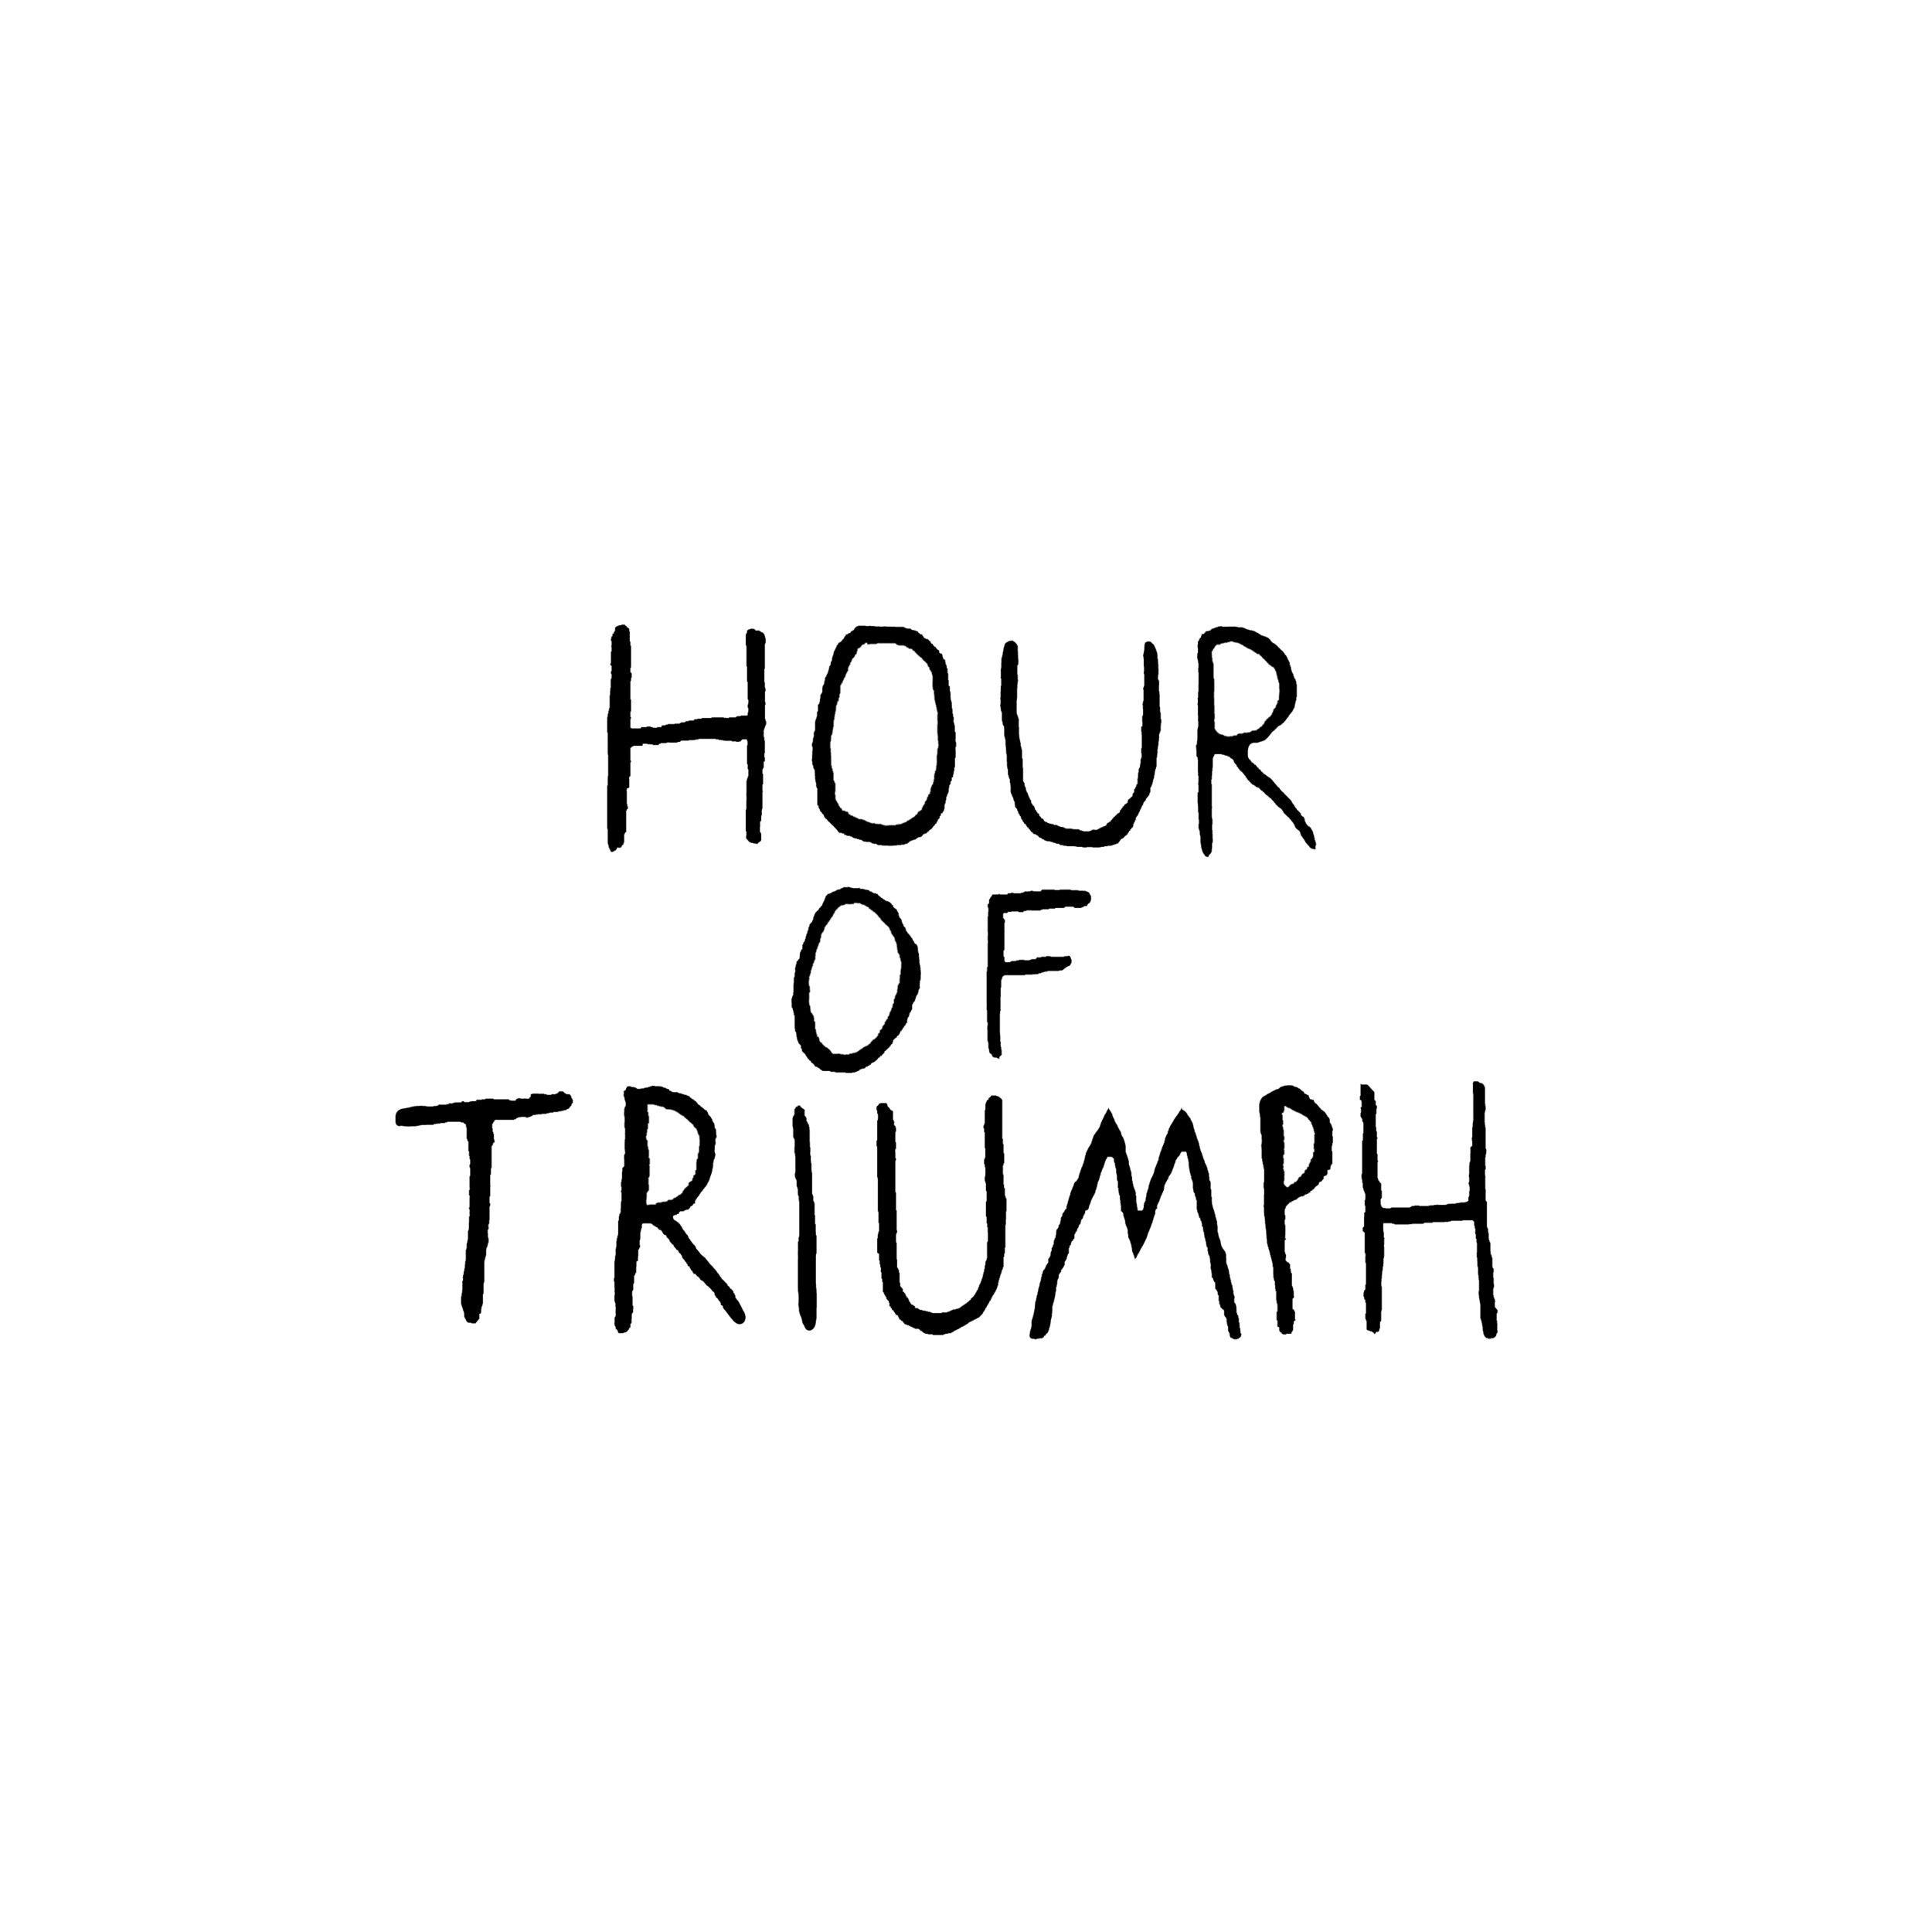 hour of triumph 4.jpg